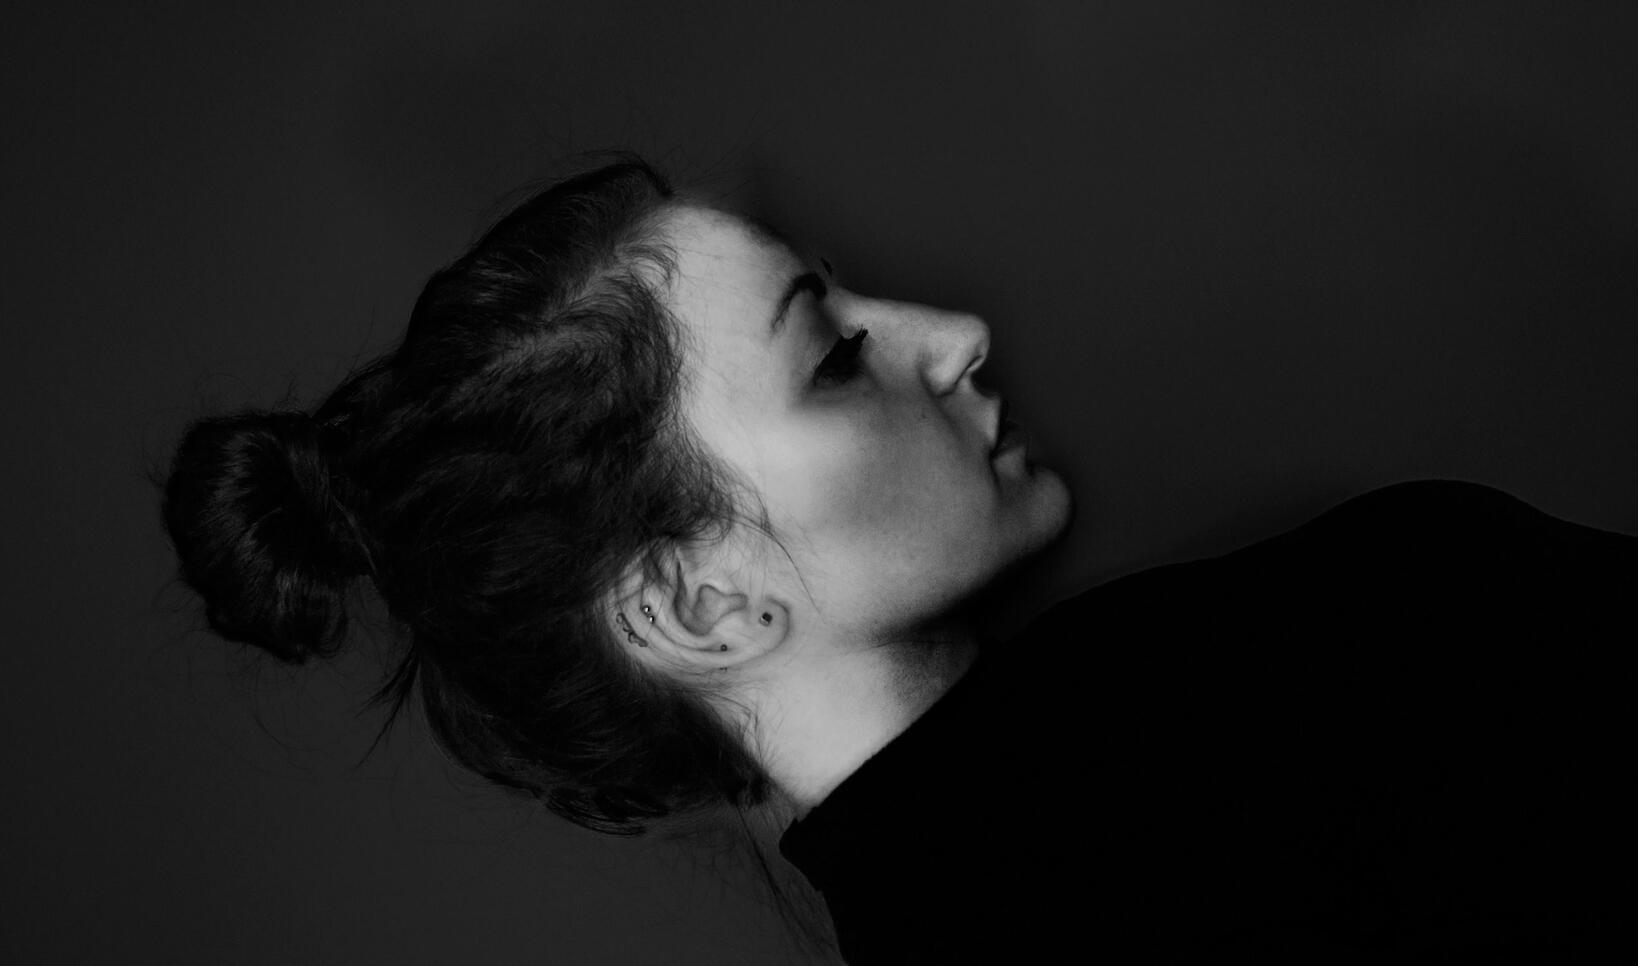 Side profile self portrait of artist.  ; Lina Barengolts